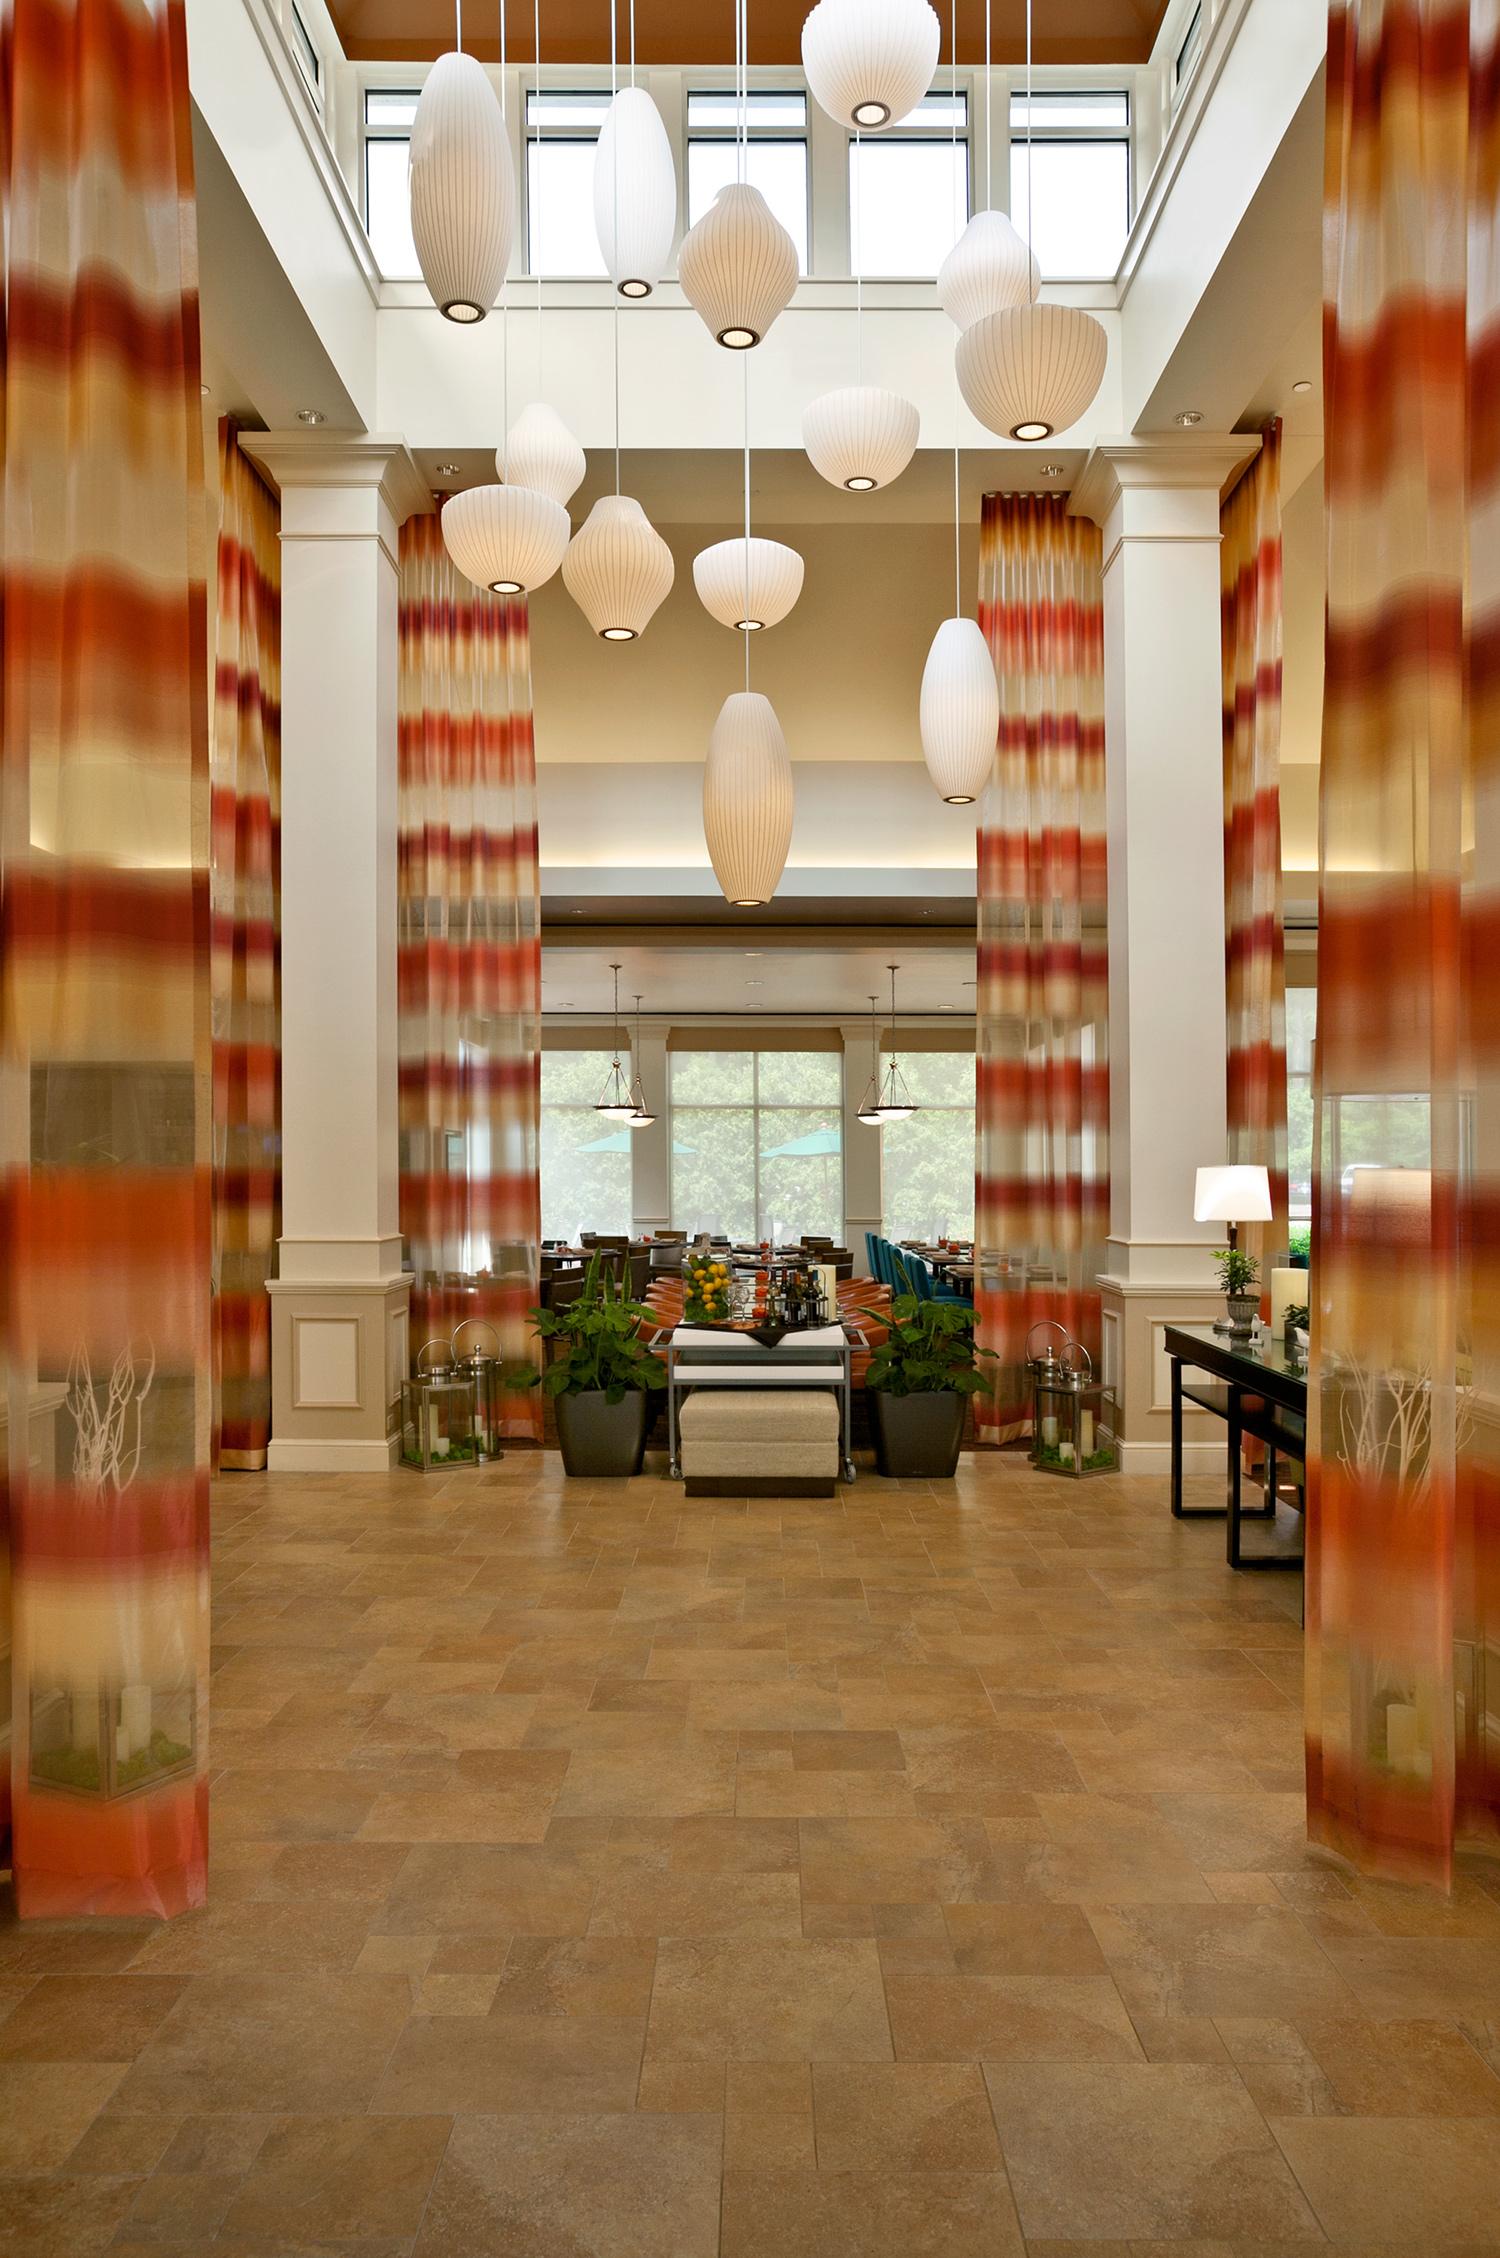 Hilton garden inn saratoga springs 125 south broadway - Hilton garden inn saratoga springs ny ...